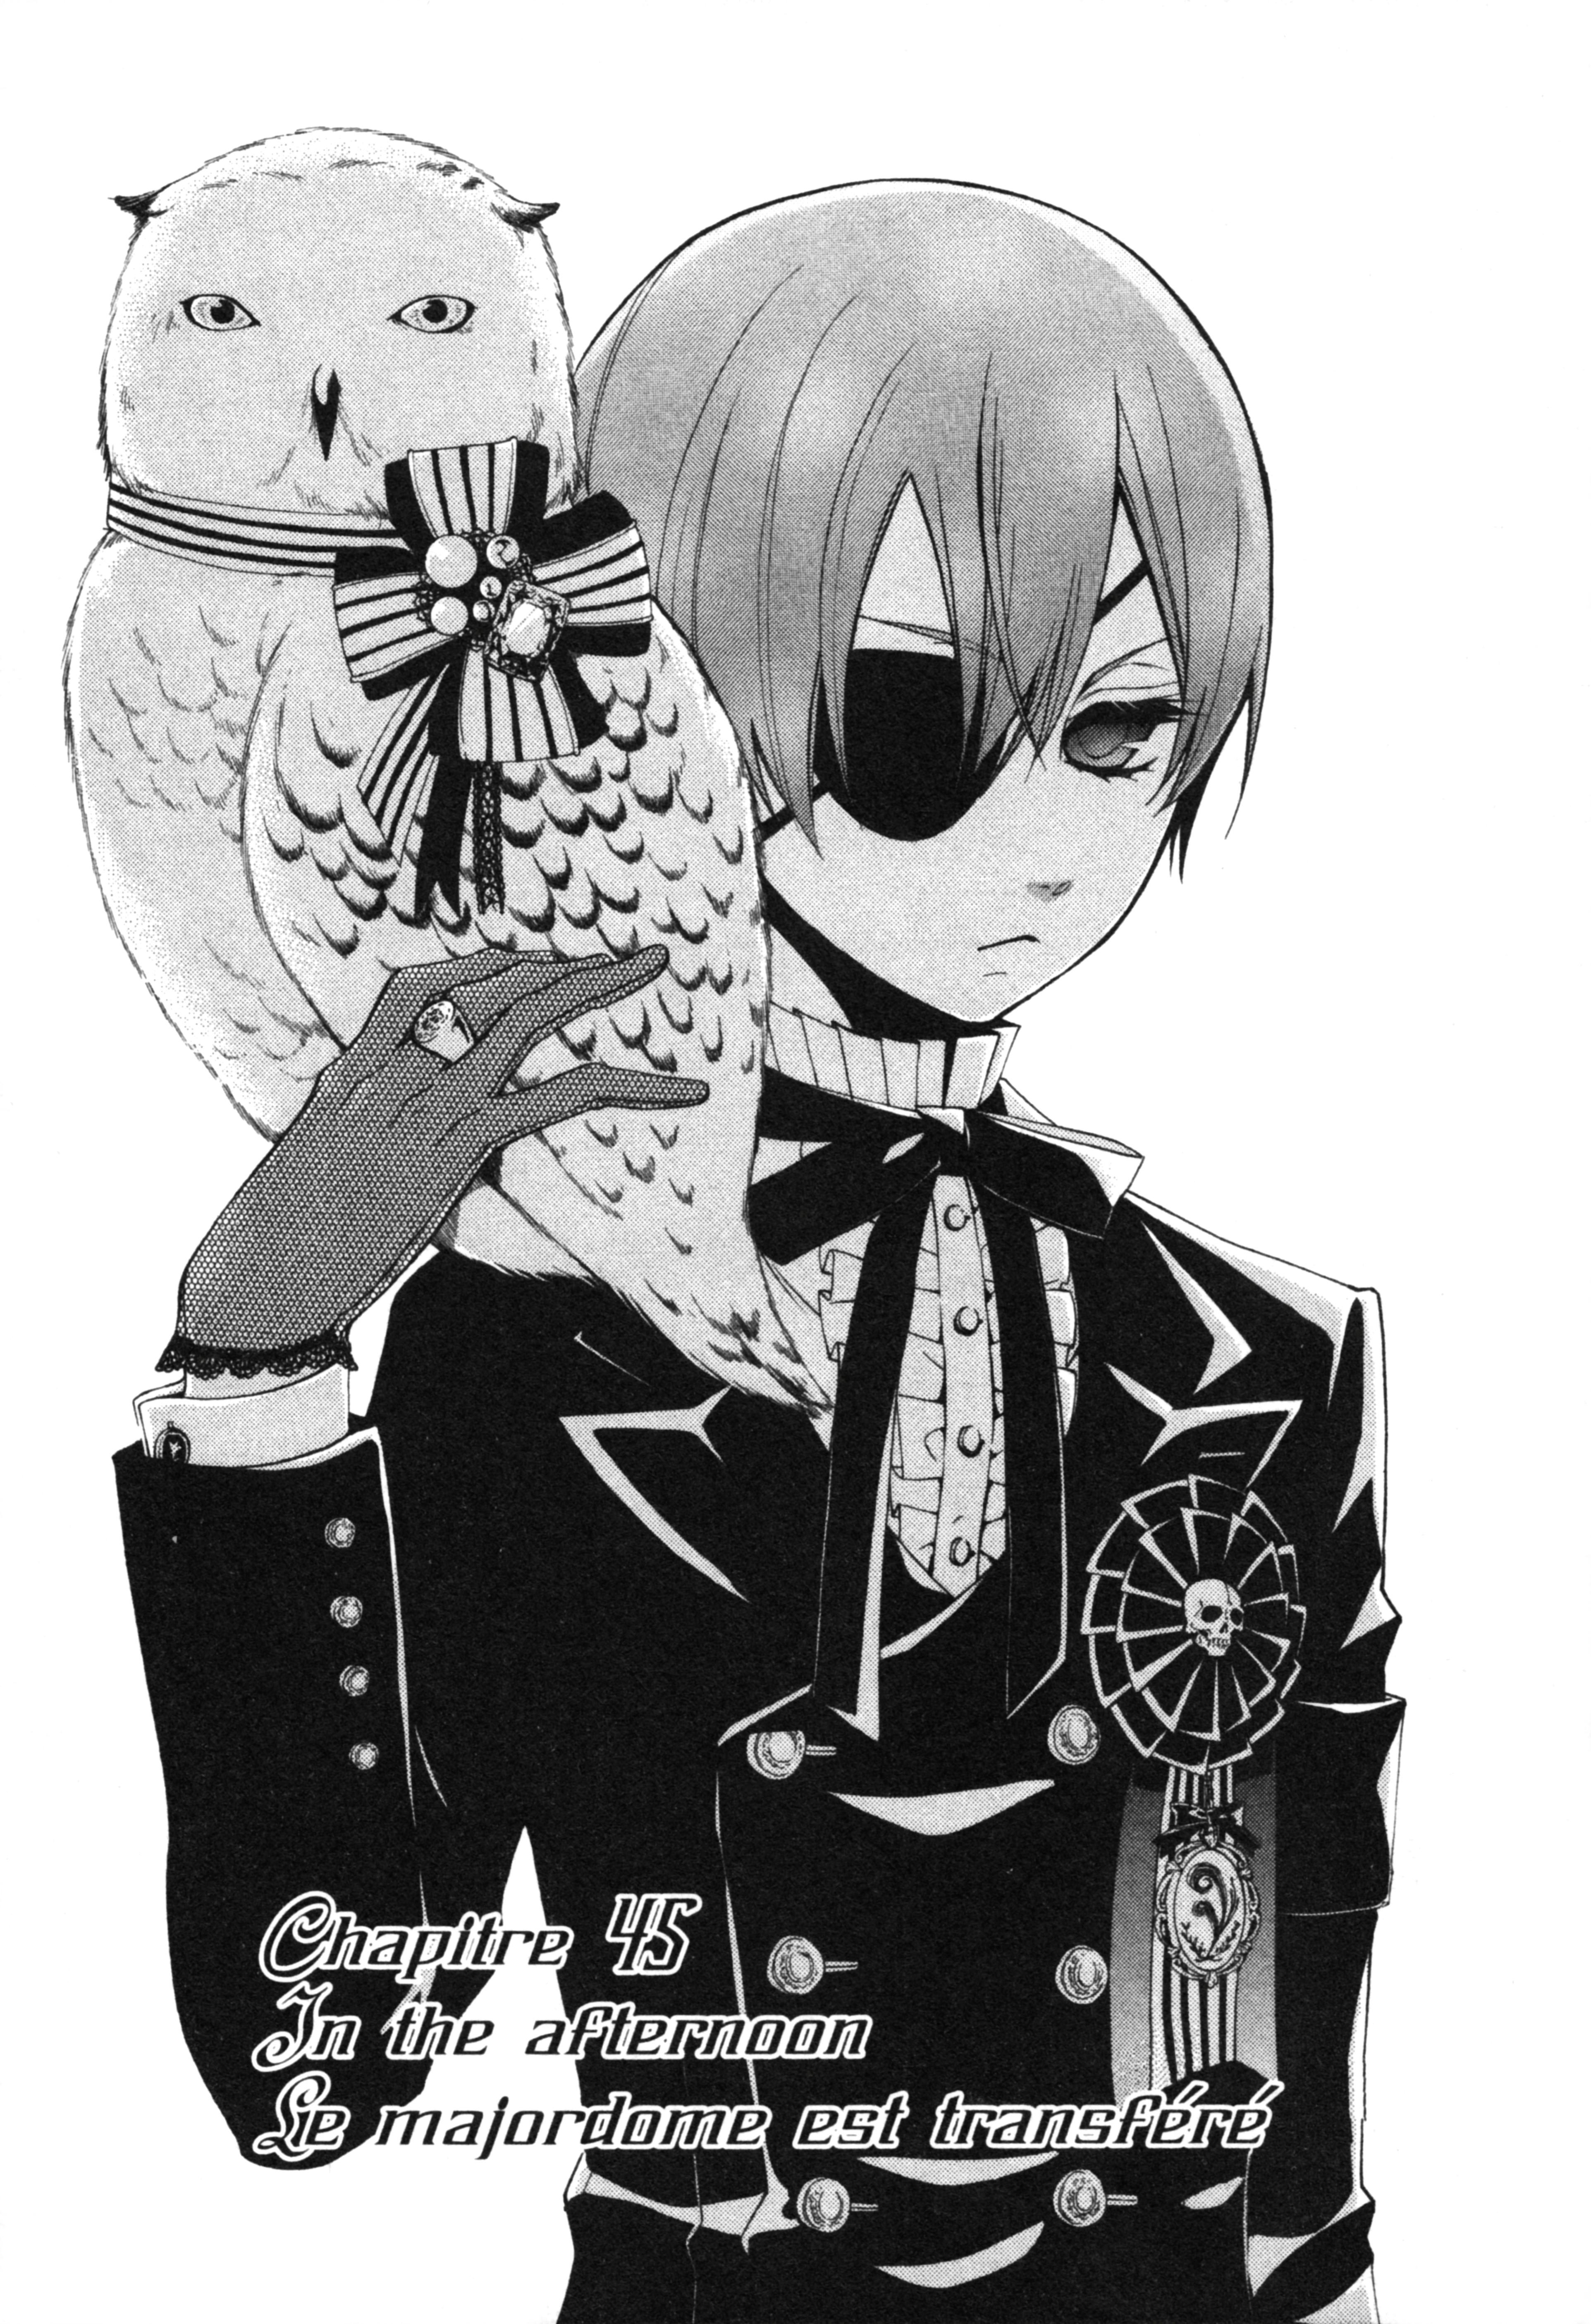 Tags: Anime, Toboso Yana, Kuroshitsuji, Ciel Phantomhive, Aristocrat